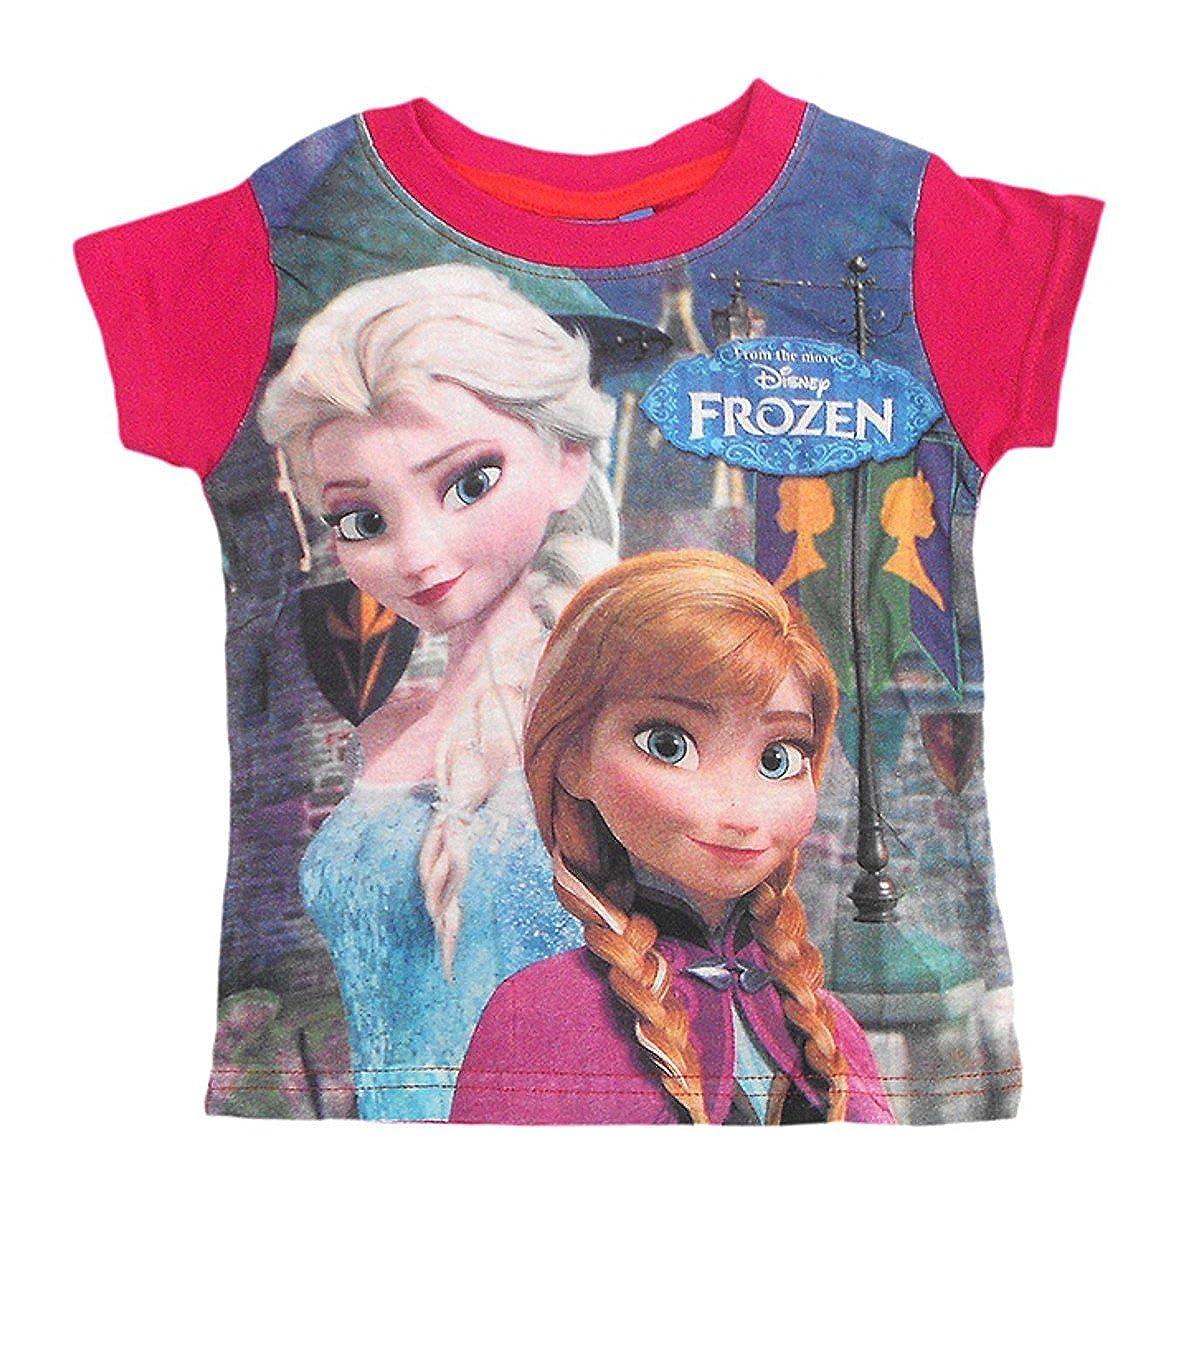 Disney Frozen Princess Girls Top Tshirt Age 5-6,7-8,9-10 Years